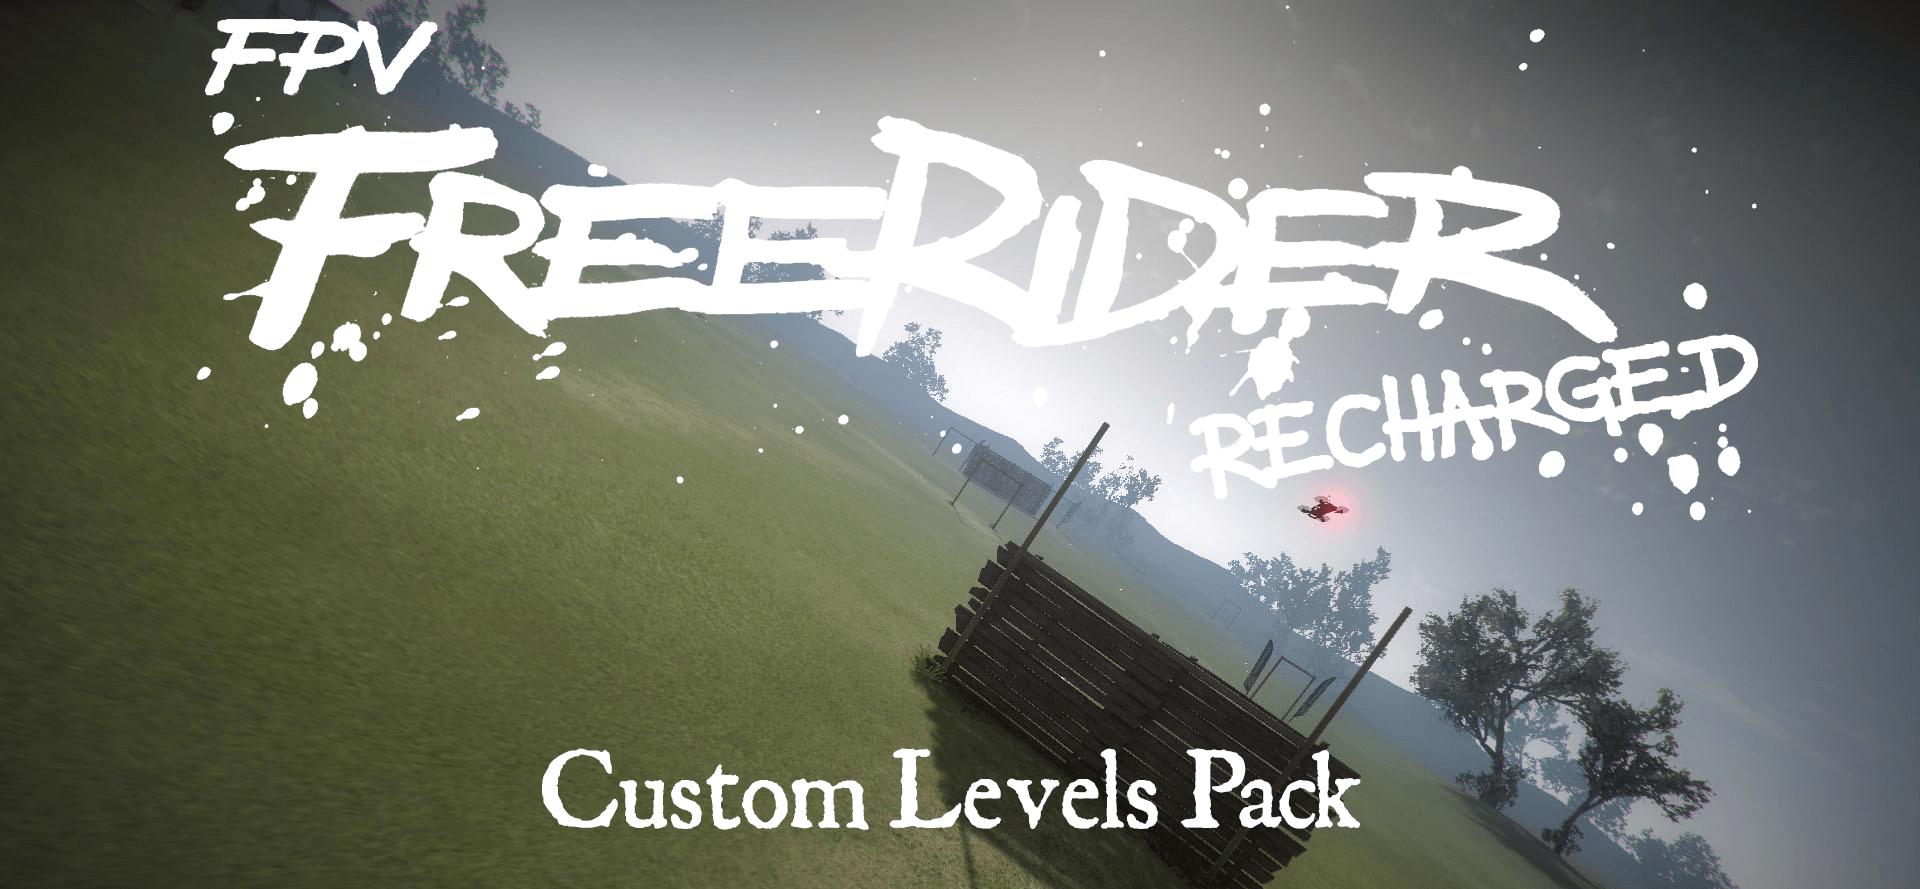 FPV Freerider Recharged Custom Maps Pack Logo